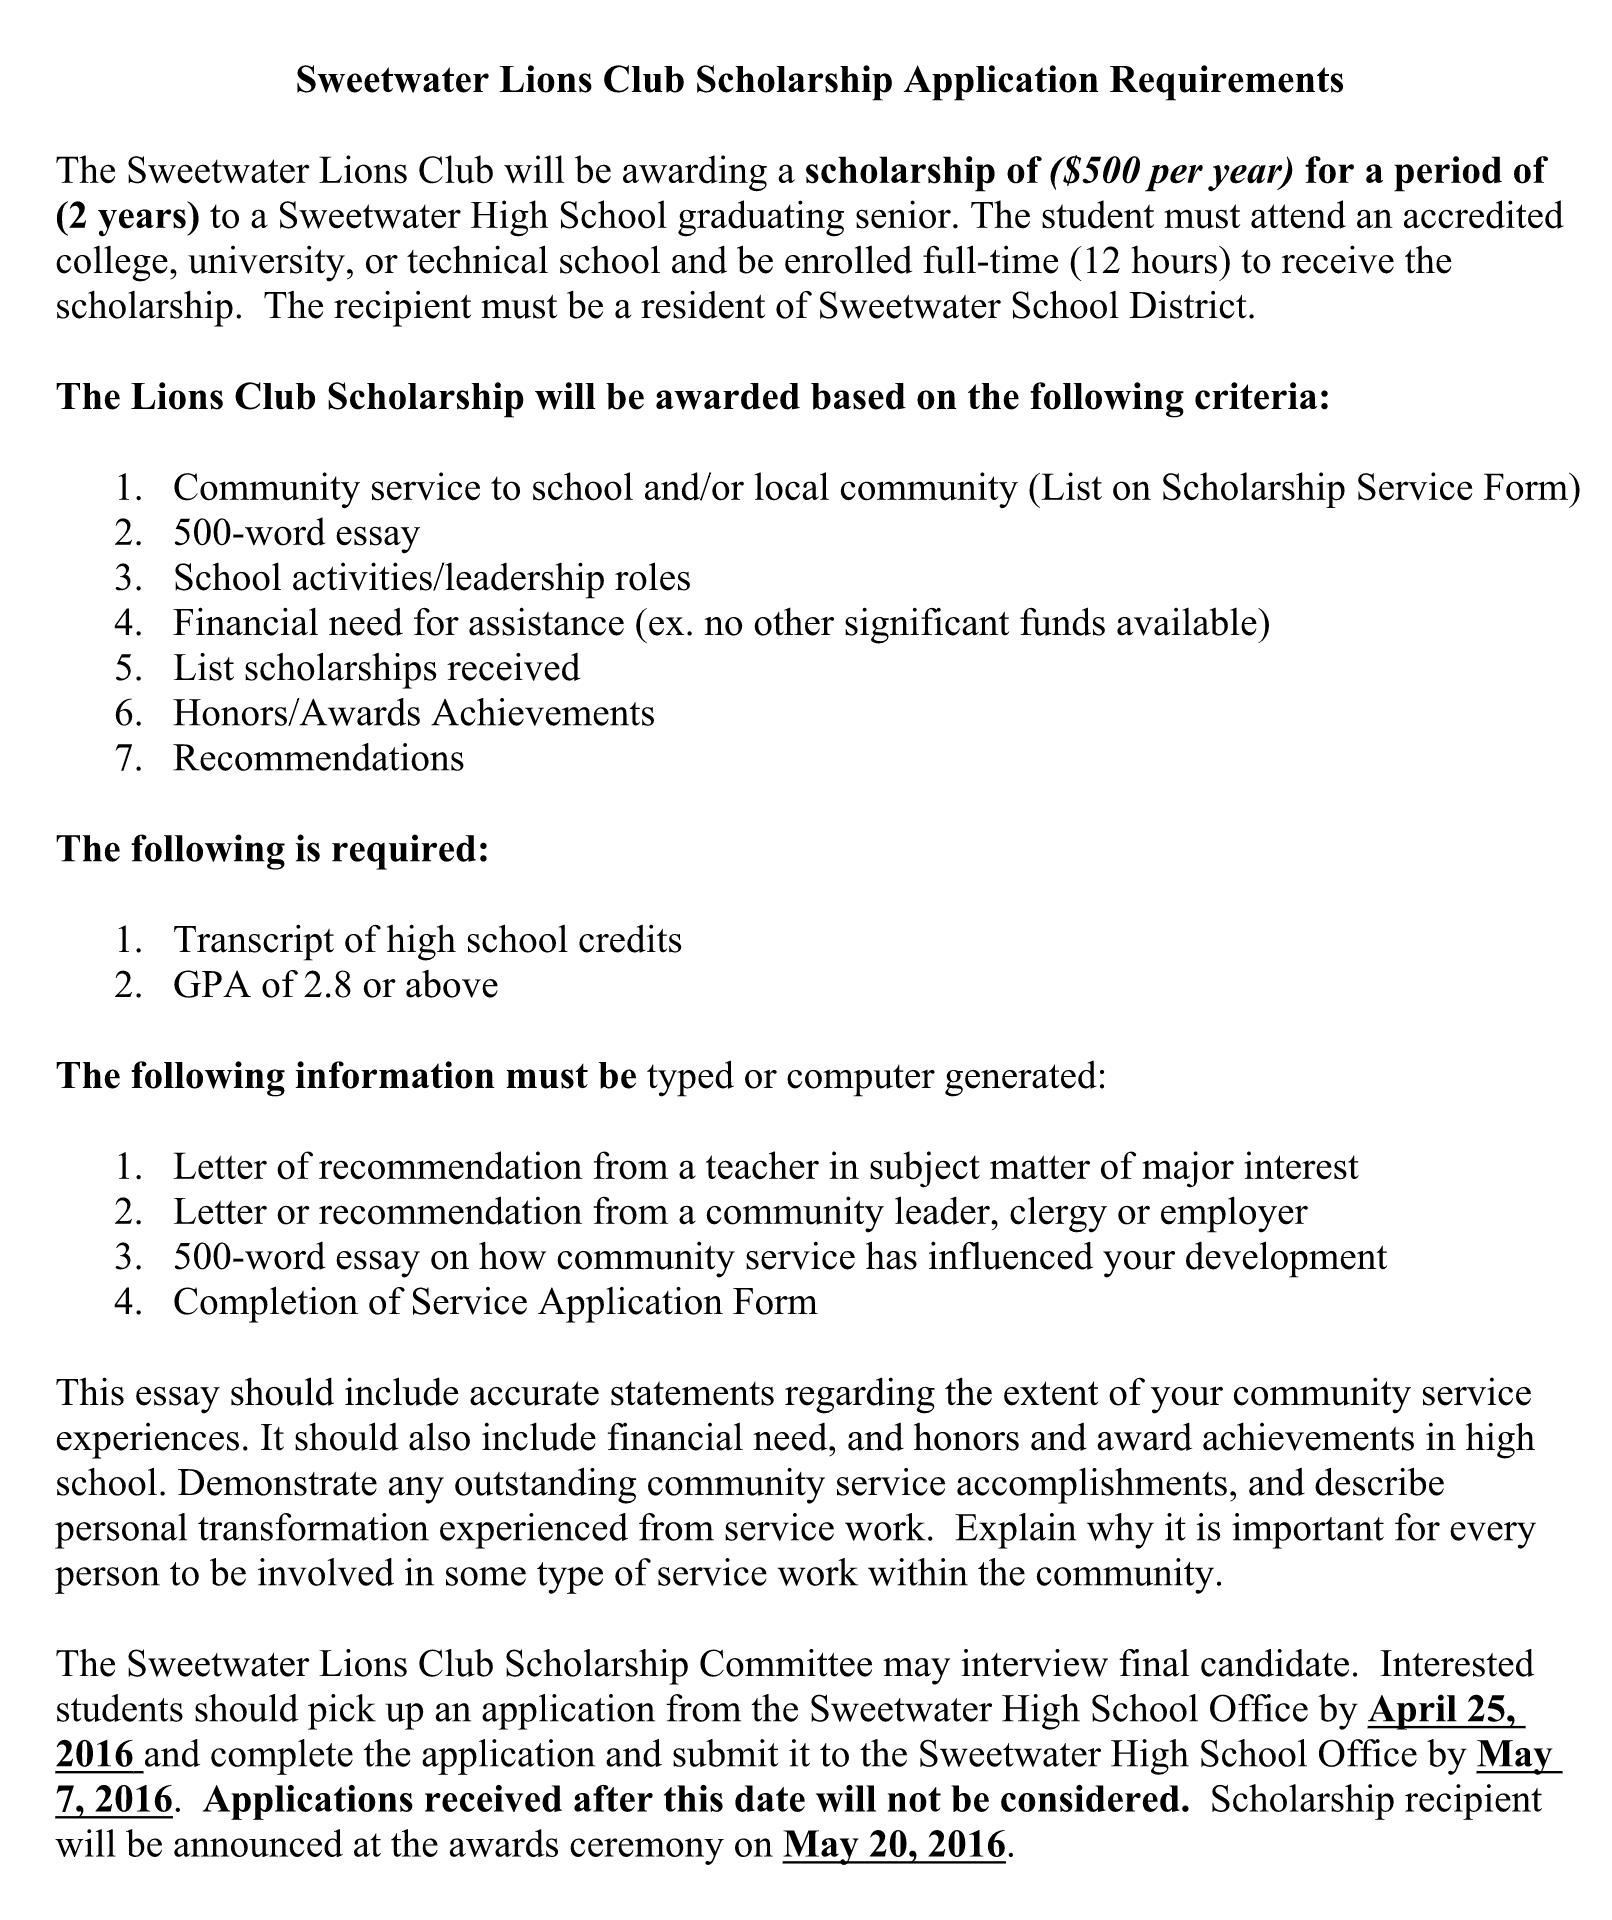 015 essay scholarships high school seniors sweetwater isd contest